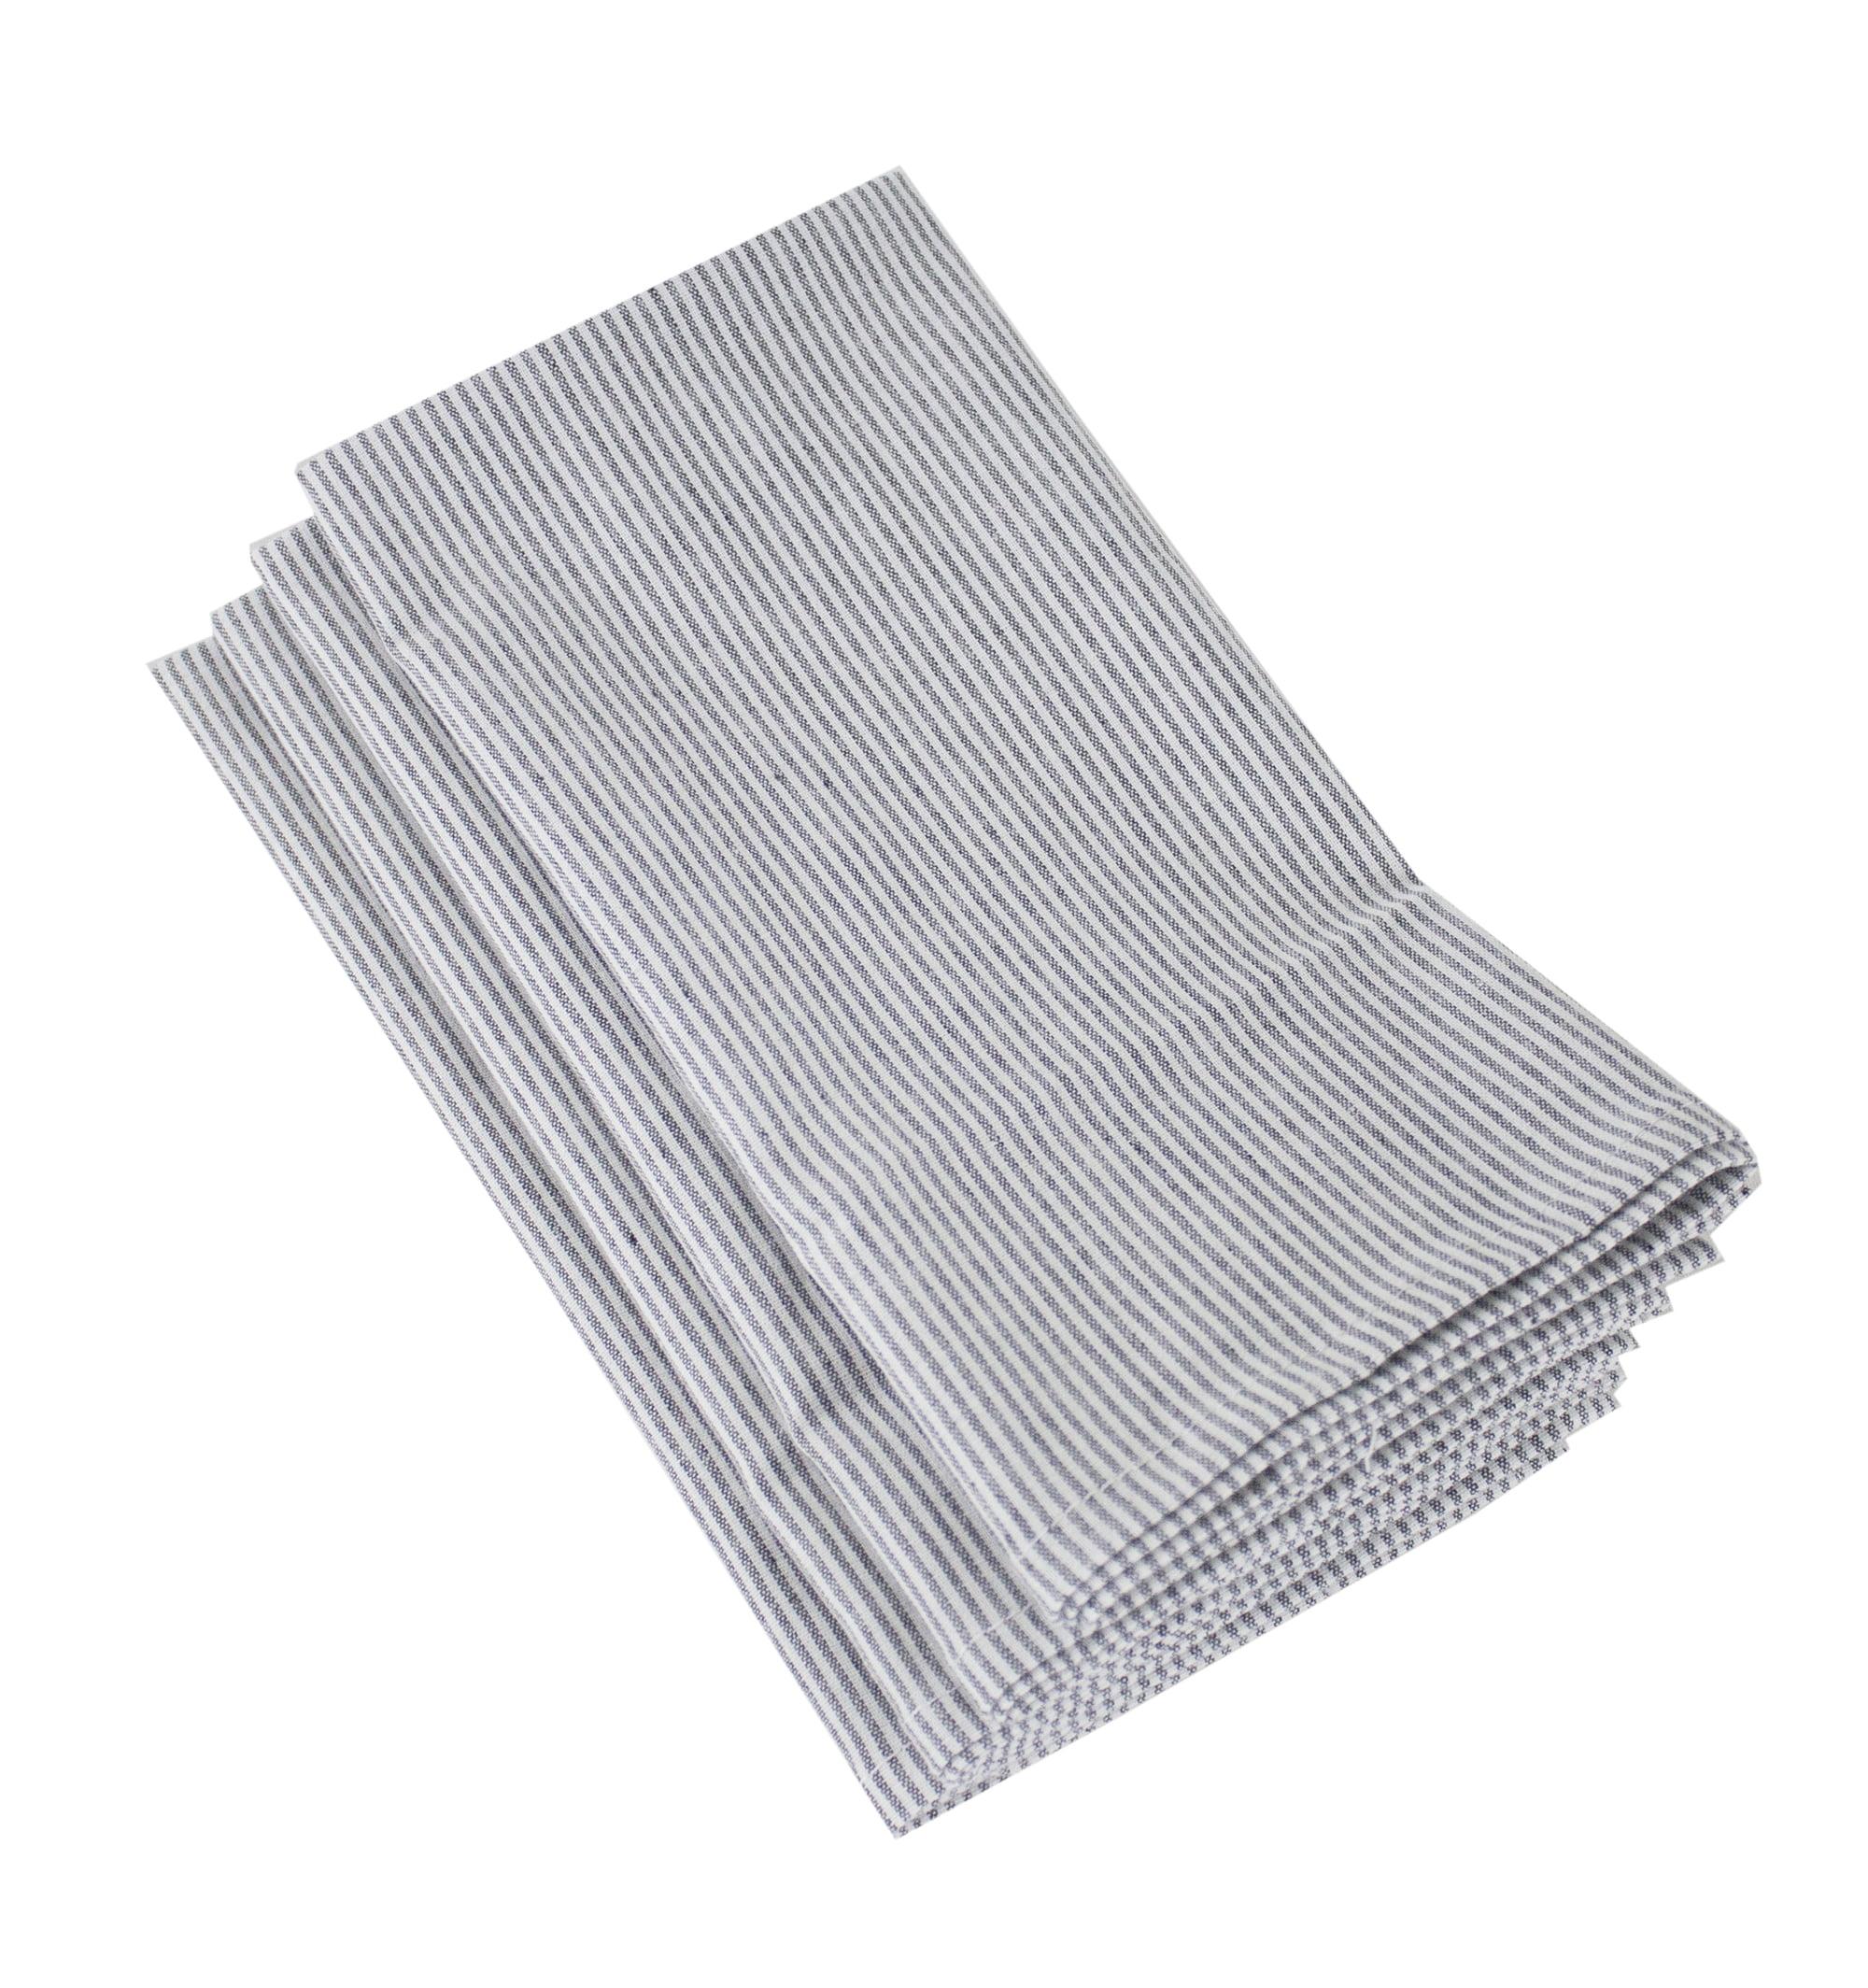 Fennco Styles Farmhouse Neutral Striped 100 Pure Cotton Cloth Napkin 20 X 20 Inch Set Of 4 Grey Walmart Com Walmart Com